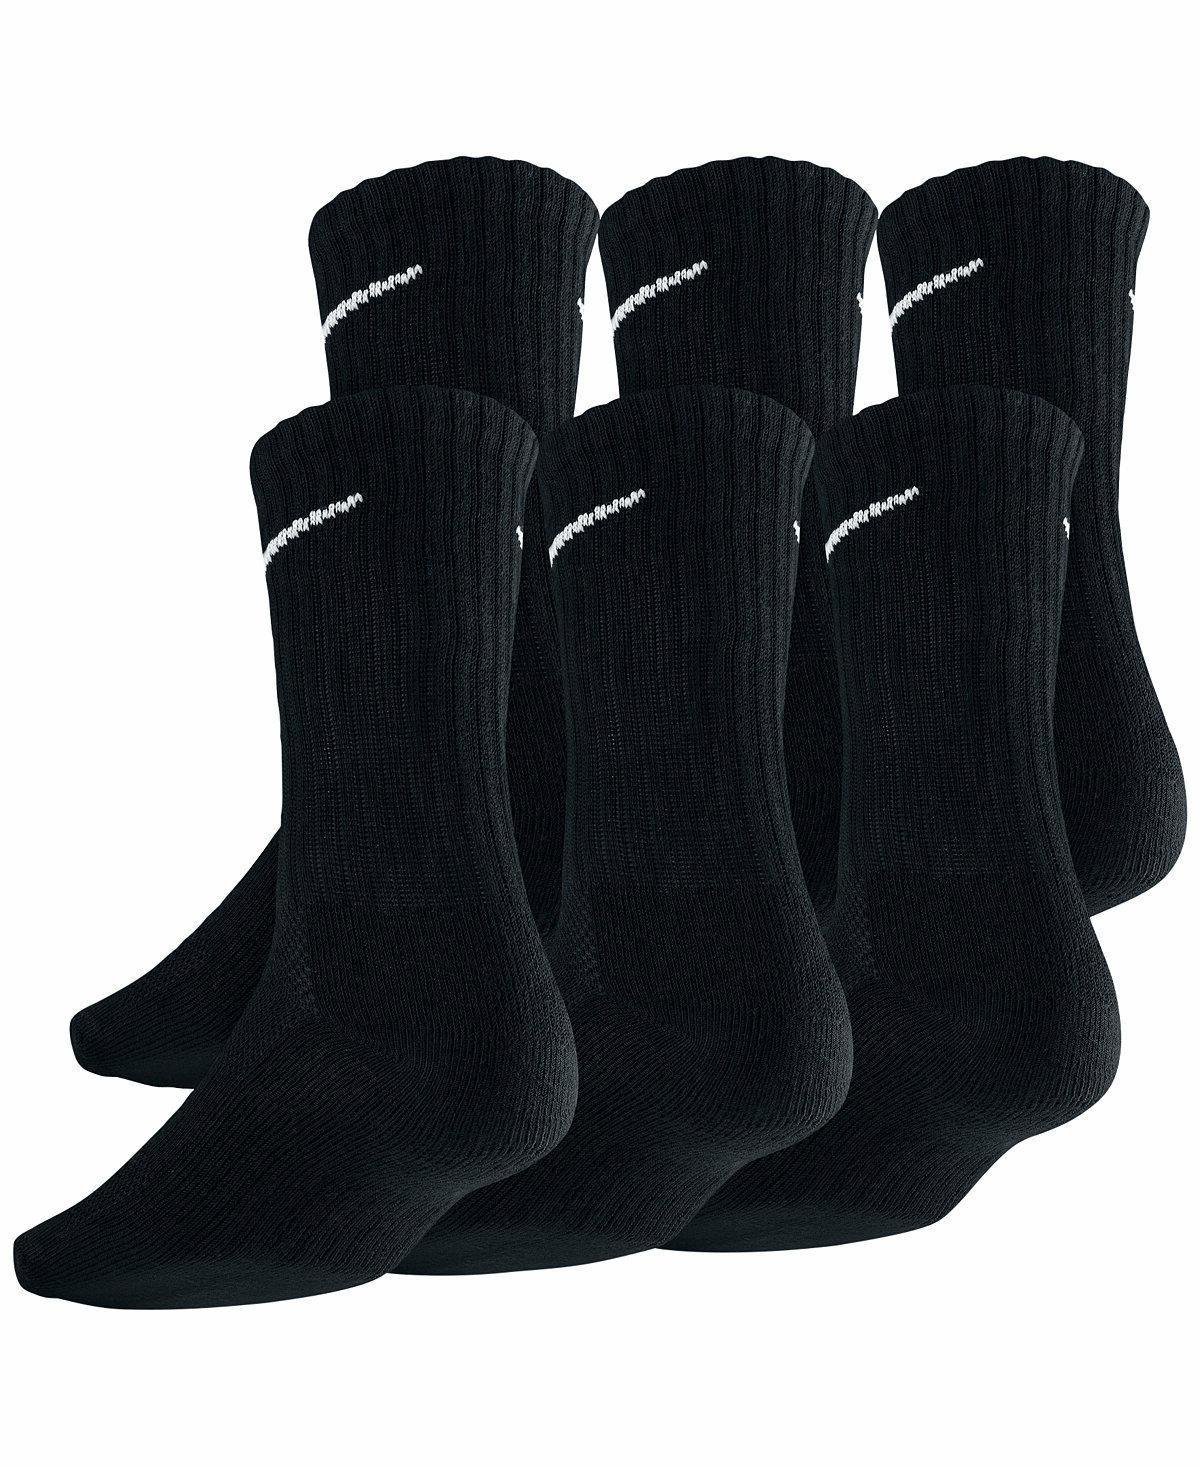 SALE Nike Fit Dry Fit Black/White Crew Socks 3 6 Large